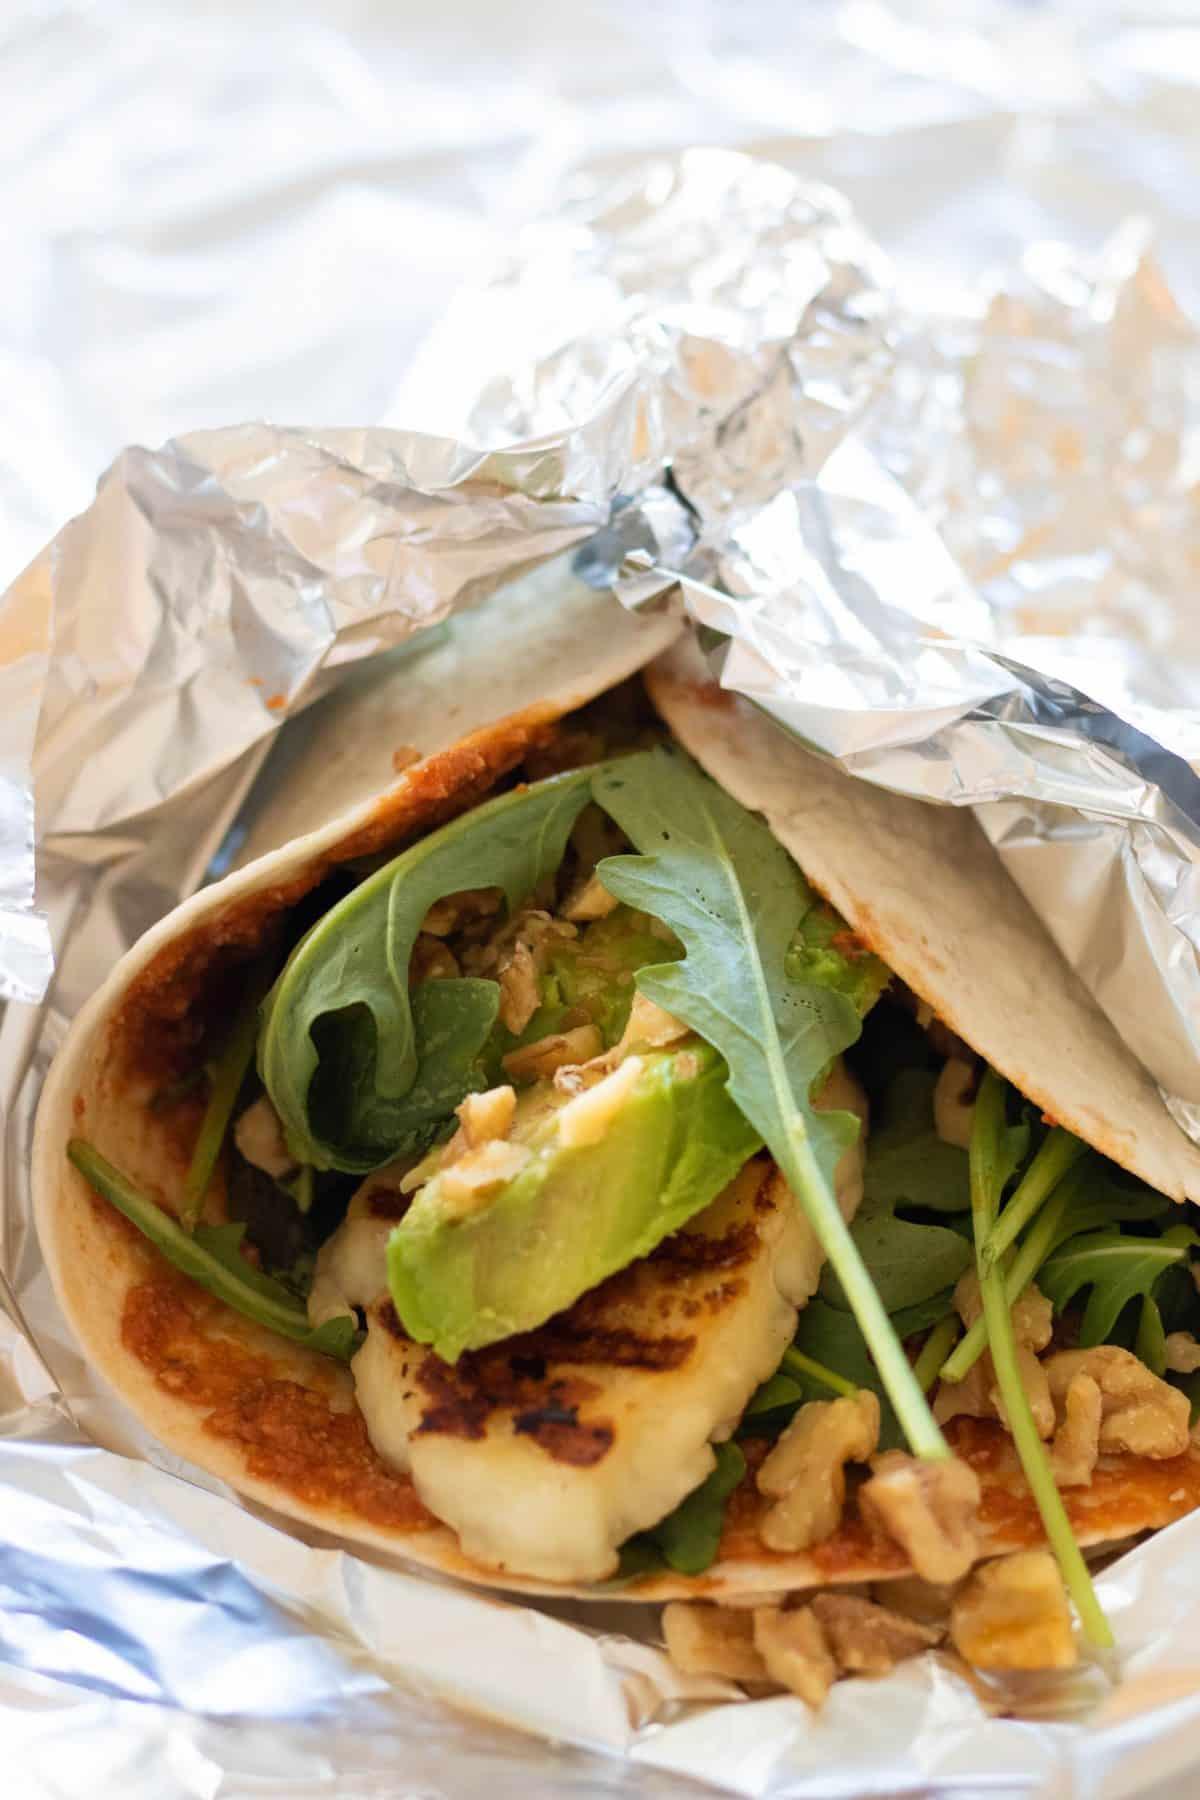 close up of wrap with halloumi, avocado and arugula in aluminium foil